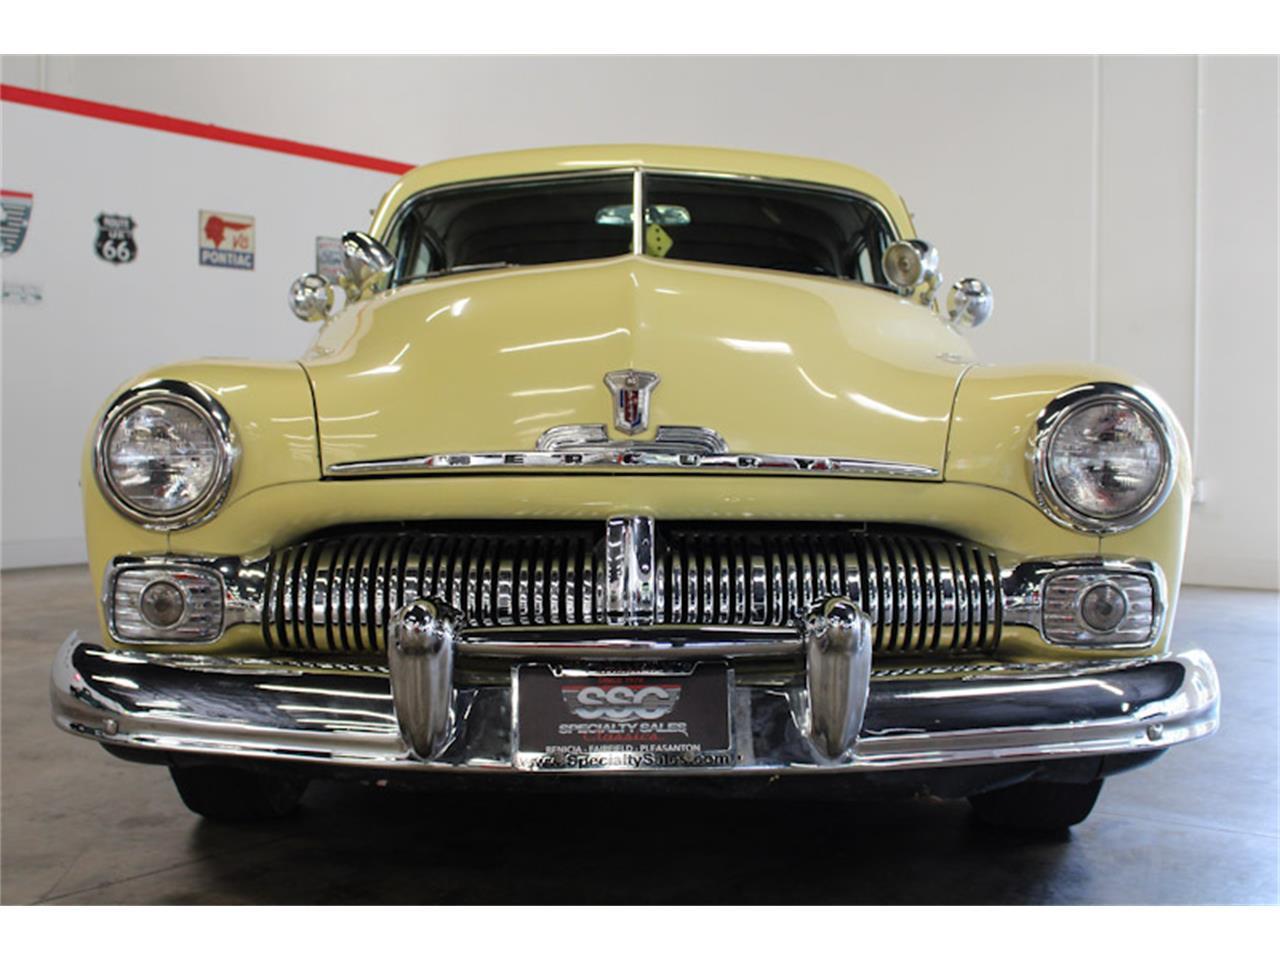 Large Picture of Classic '50 Mercury Hot Rod located in California - $29,990.00 - OJFQ